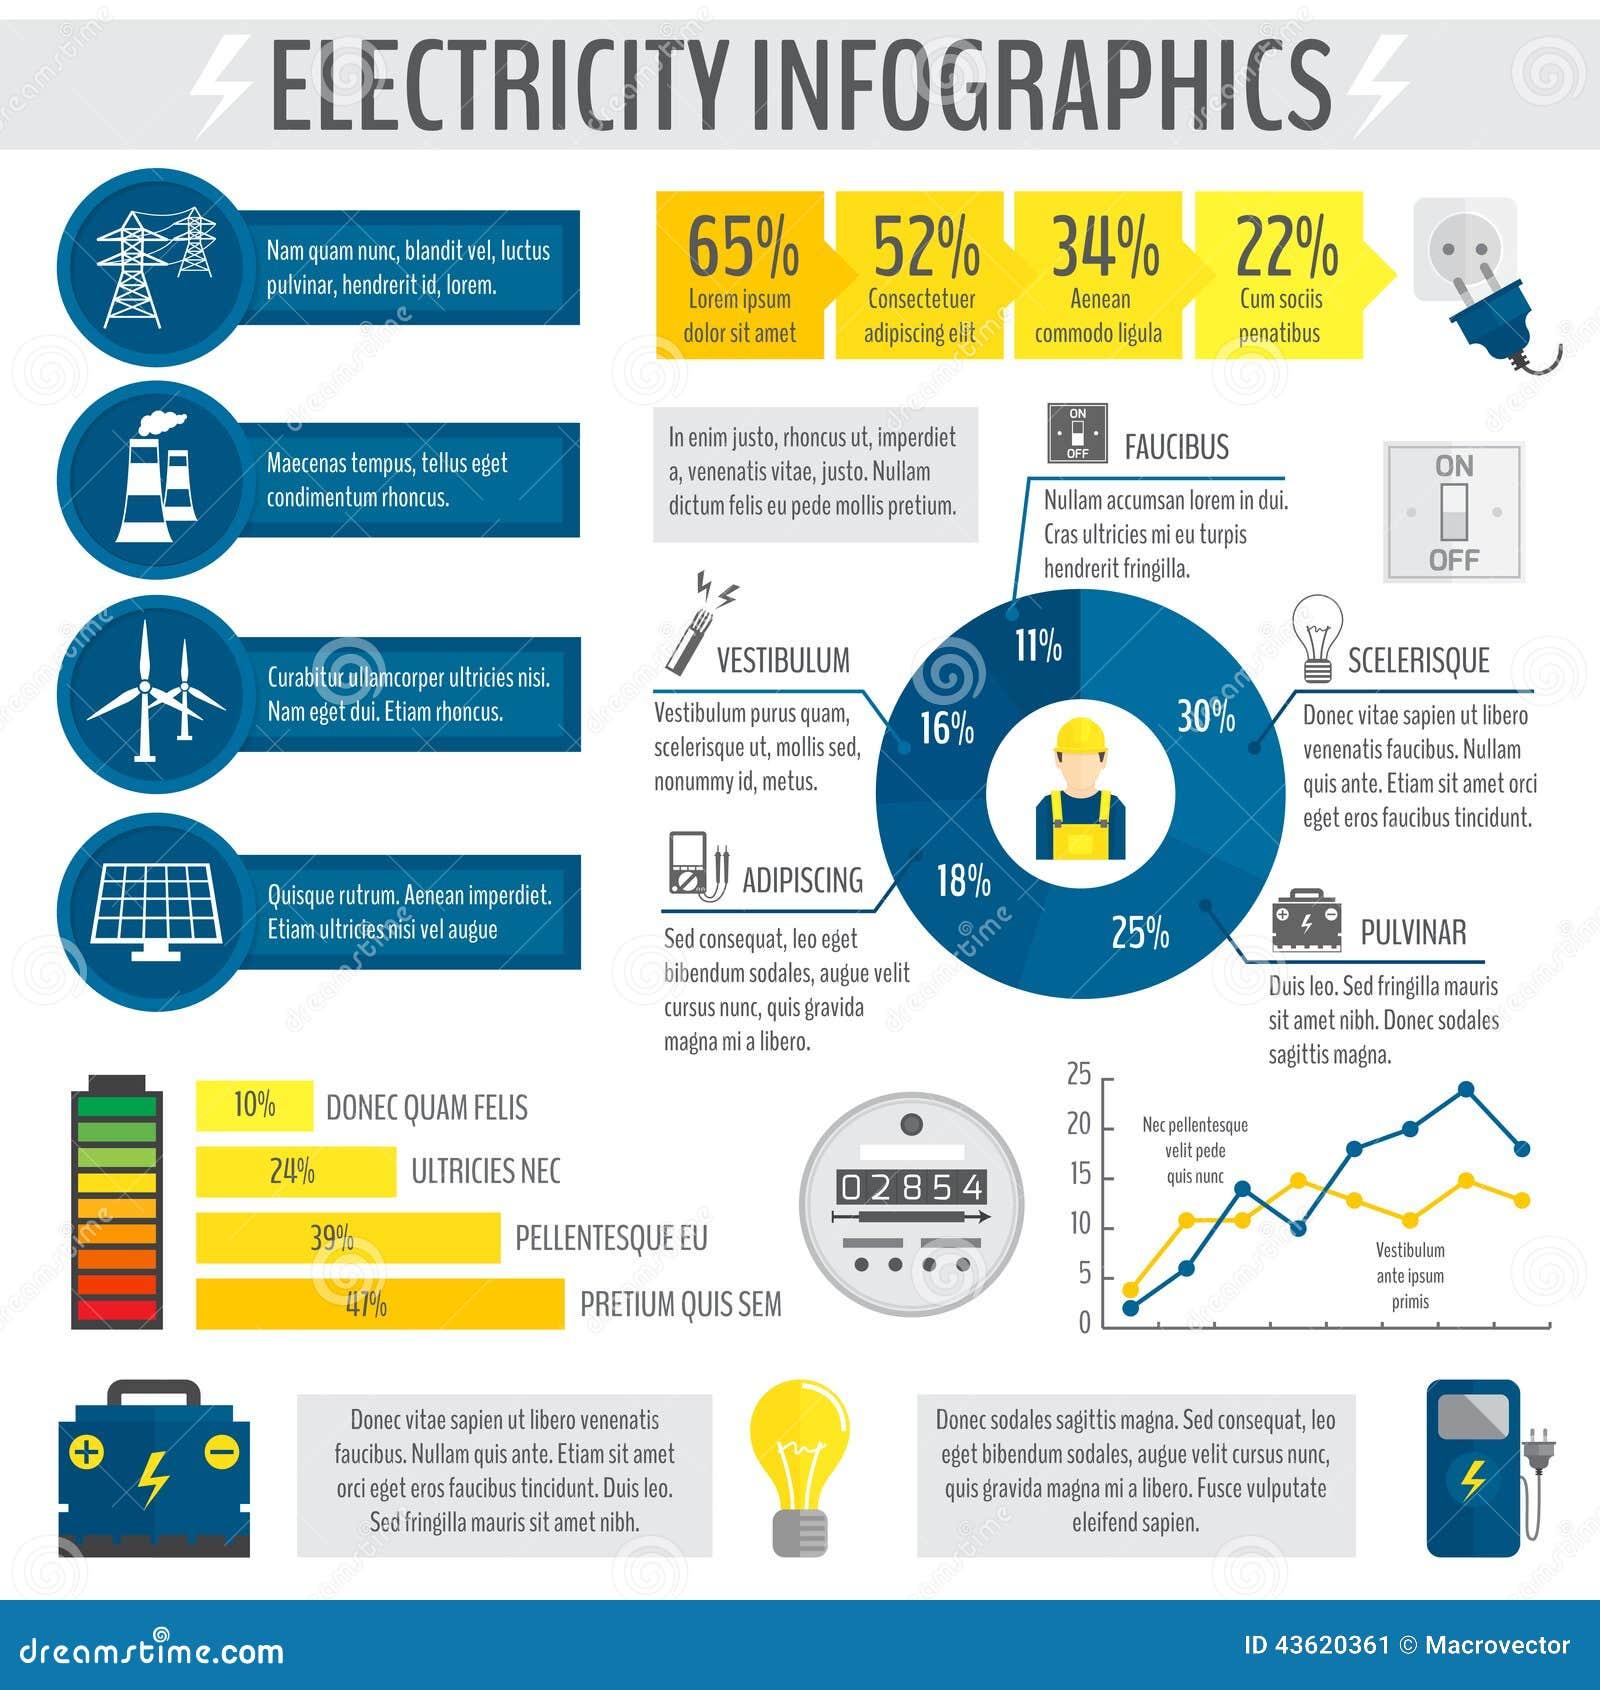 Electricidad infographic